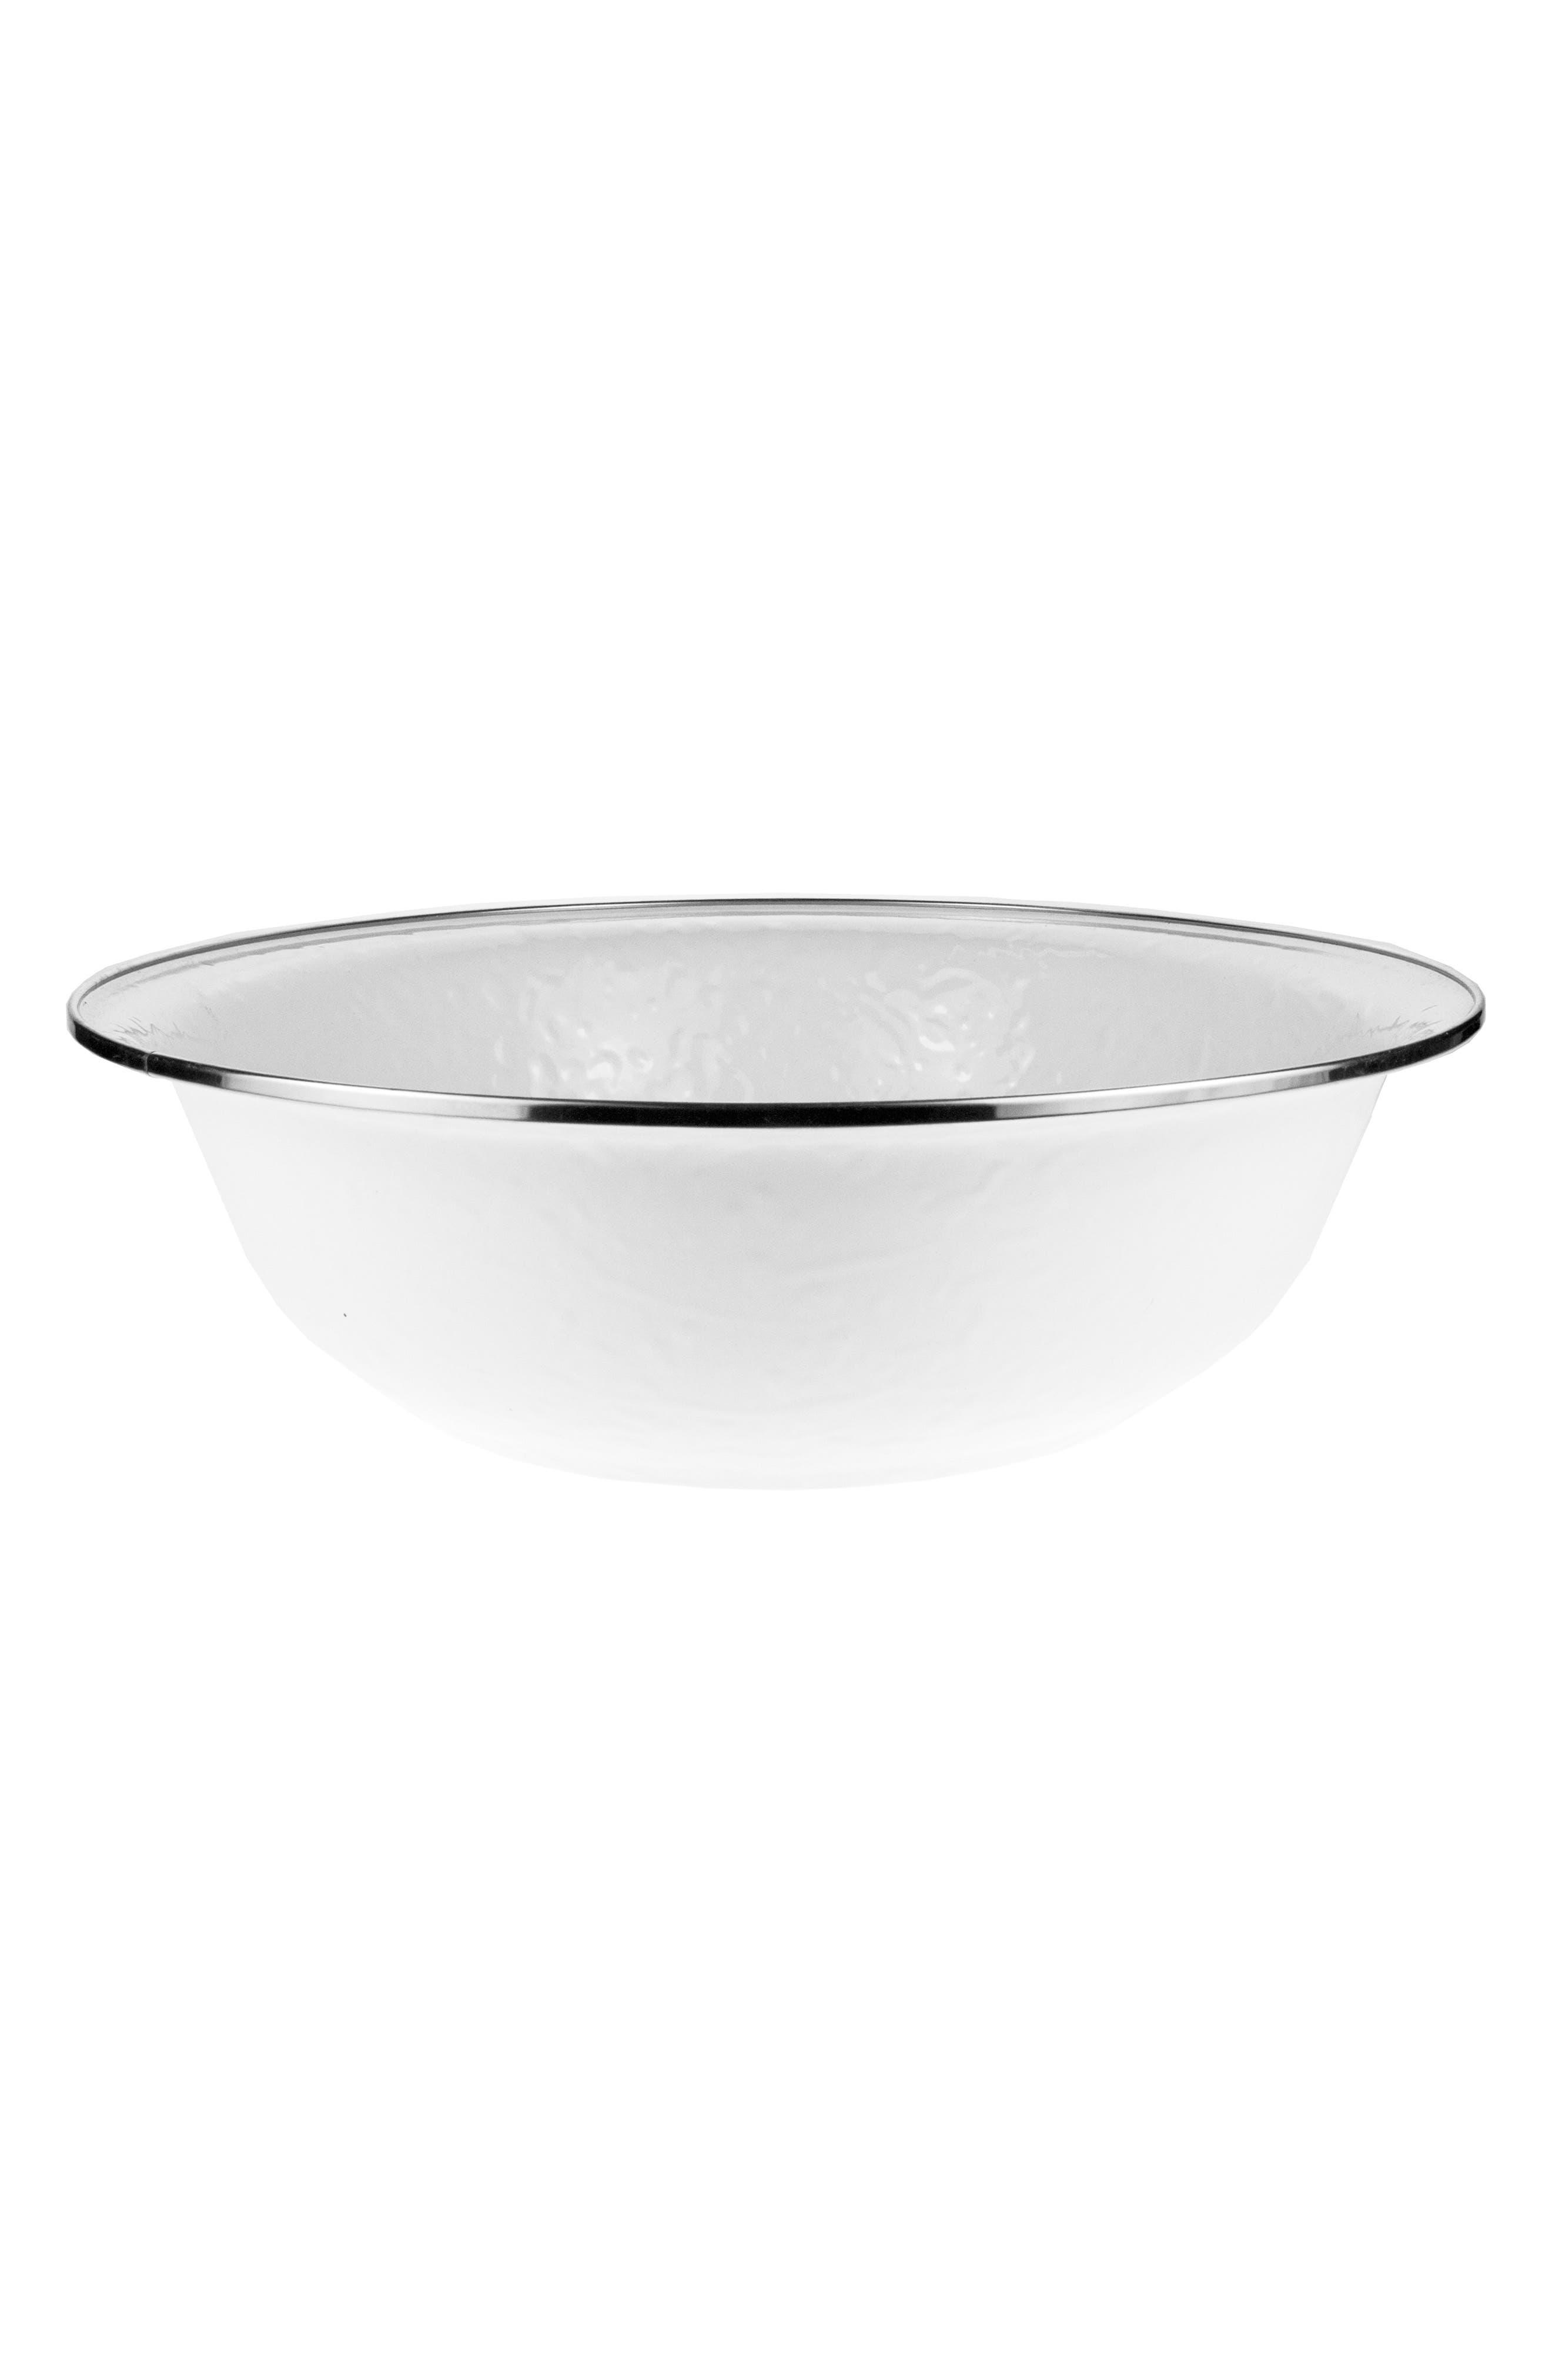 Serving Bowl,                             Main thumbnail 1, color,                             SOLID WHITE